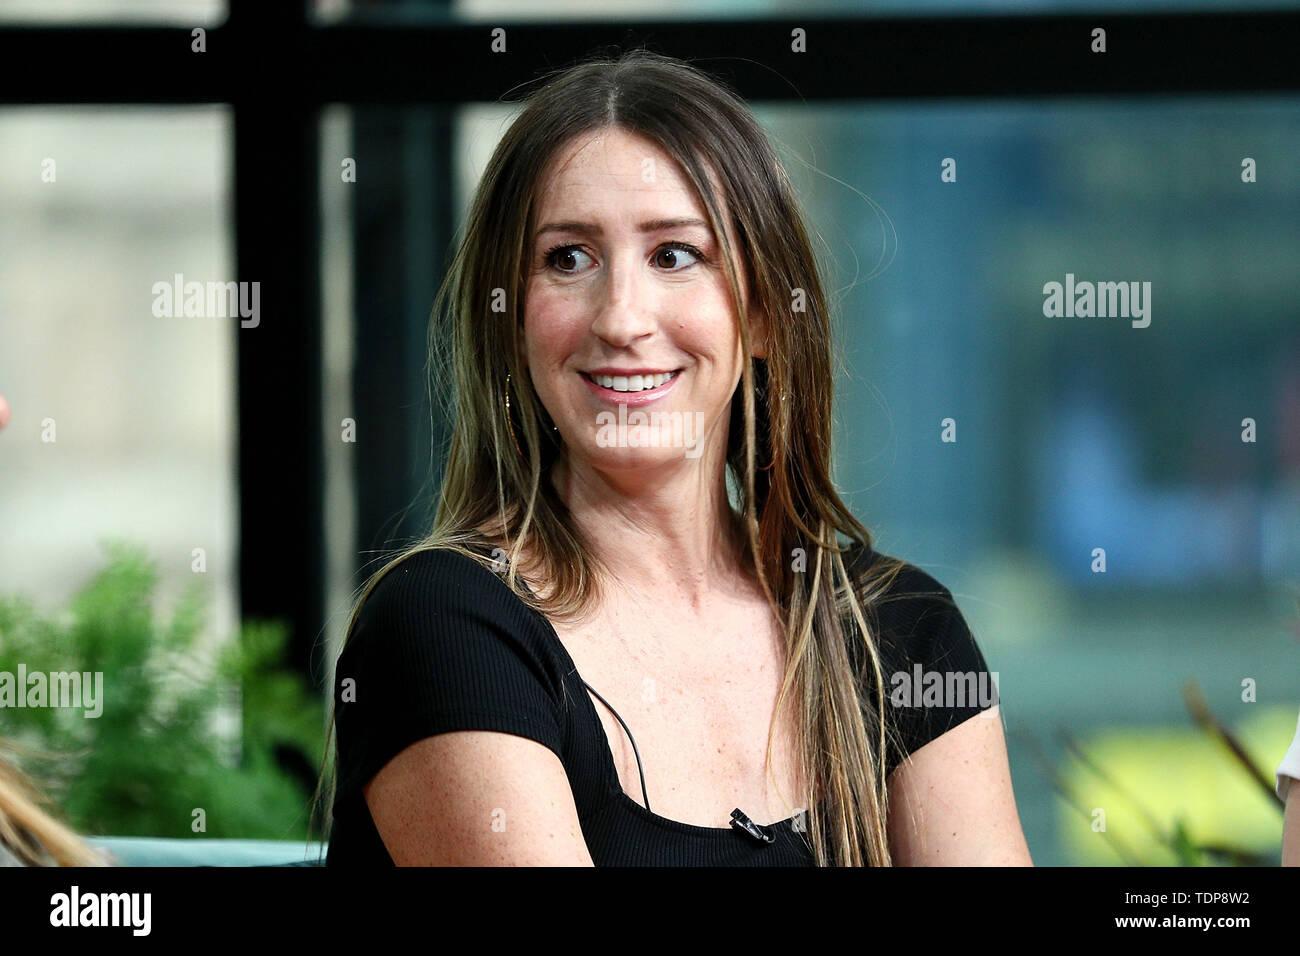 New York, USA. 17 June, 2019. Ashley Hesseltine at the BUILD Brunch Show at BUILD Studio. Credit: Steve Mack/Alamy Live News - Stock Image